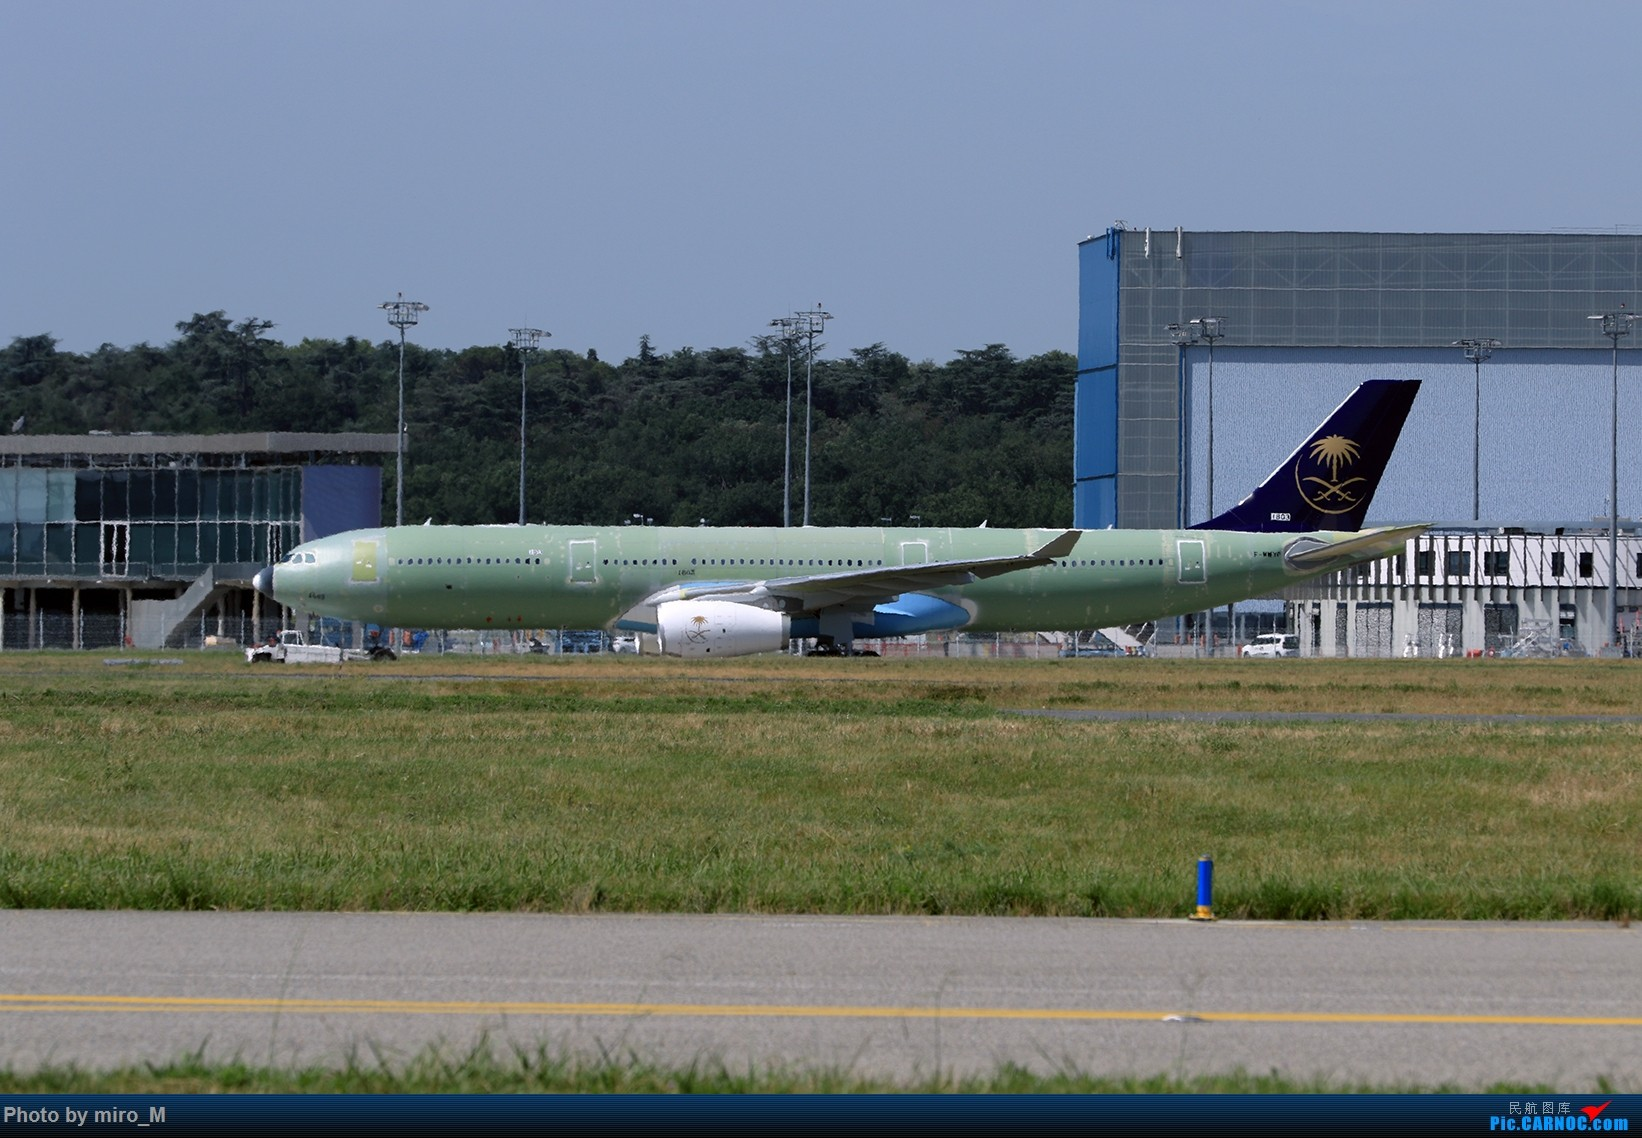 Re:[原创]欧洲小众机型体验之旅,附所到的机场拍机图片(中) AIRBUS A330-300 F-WWYP TLS